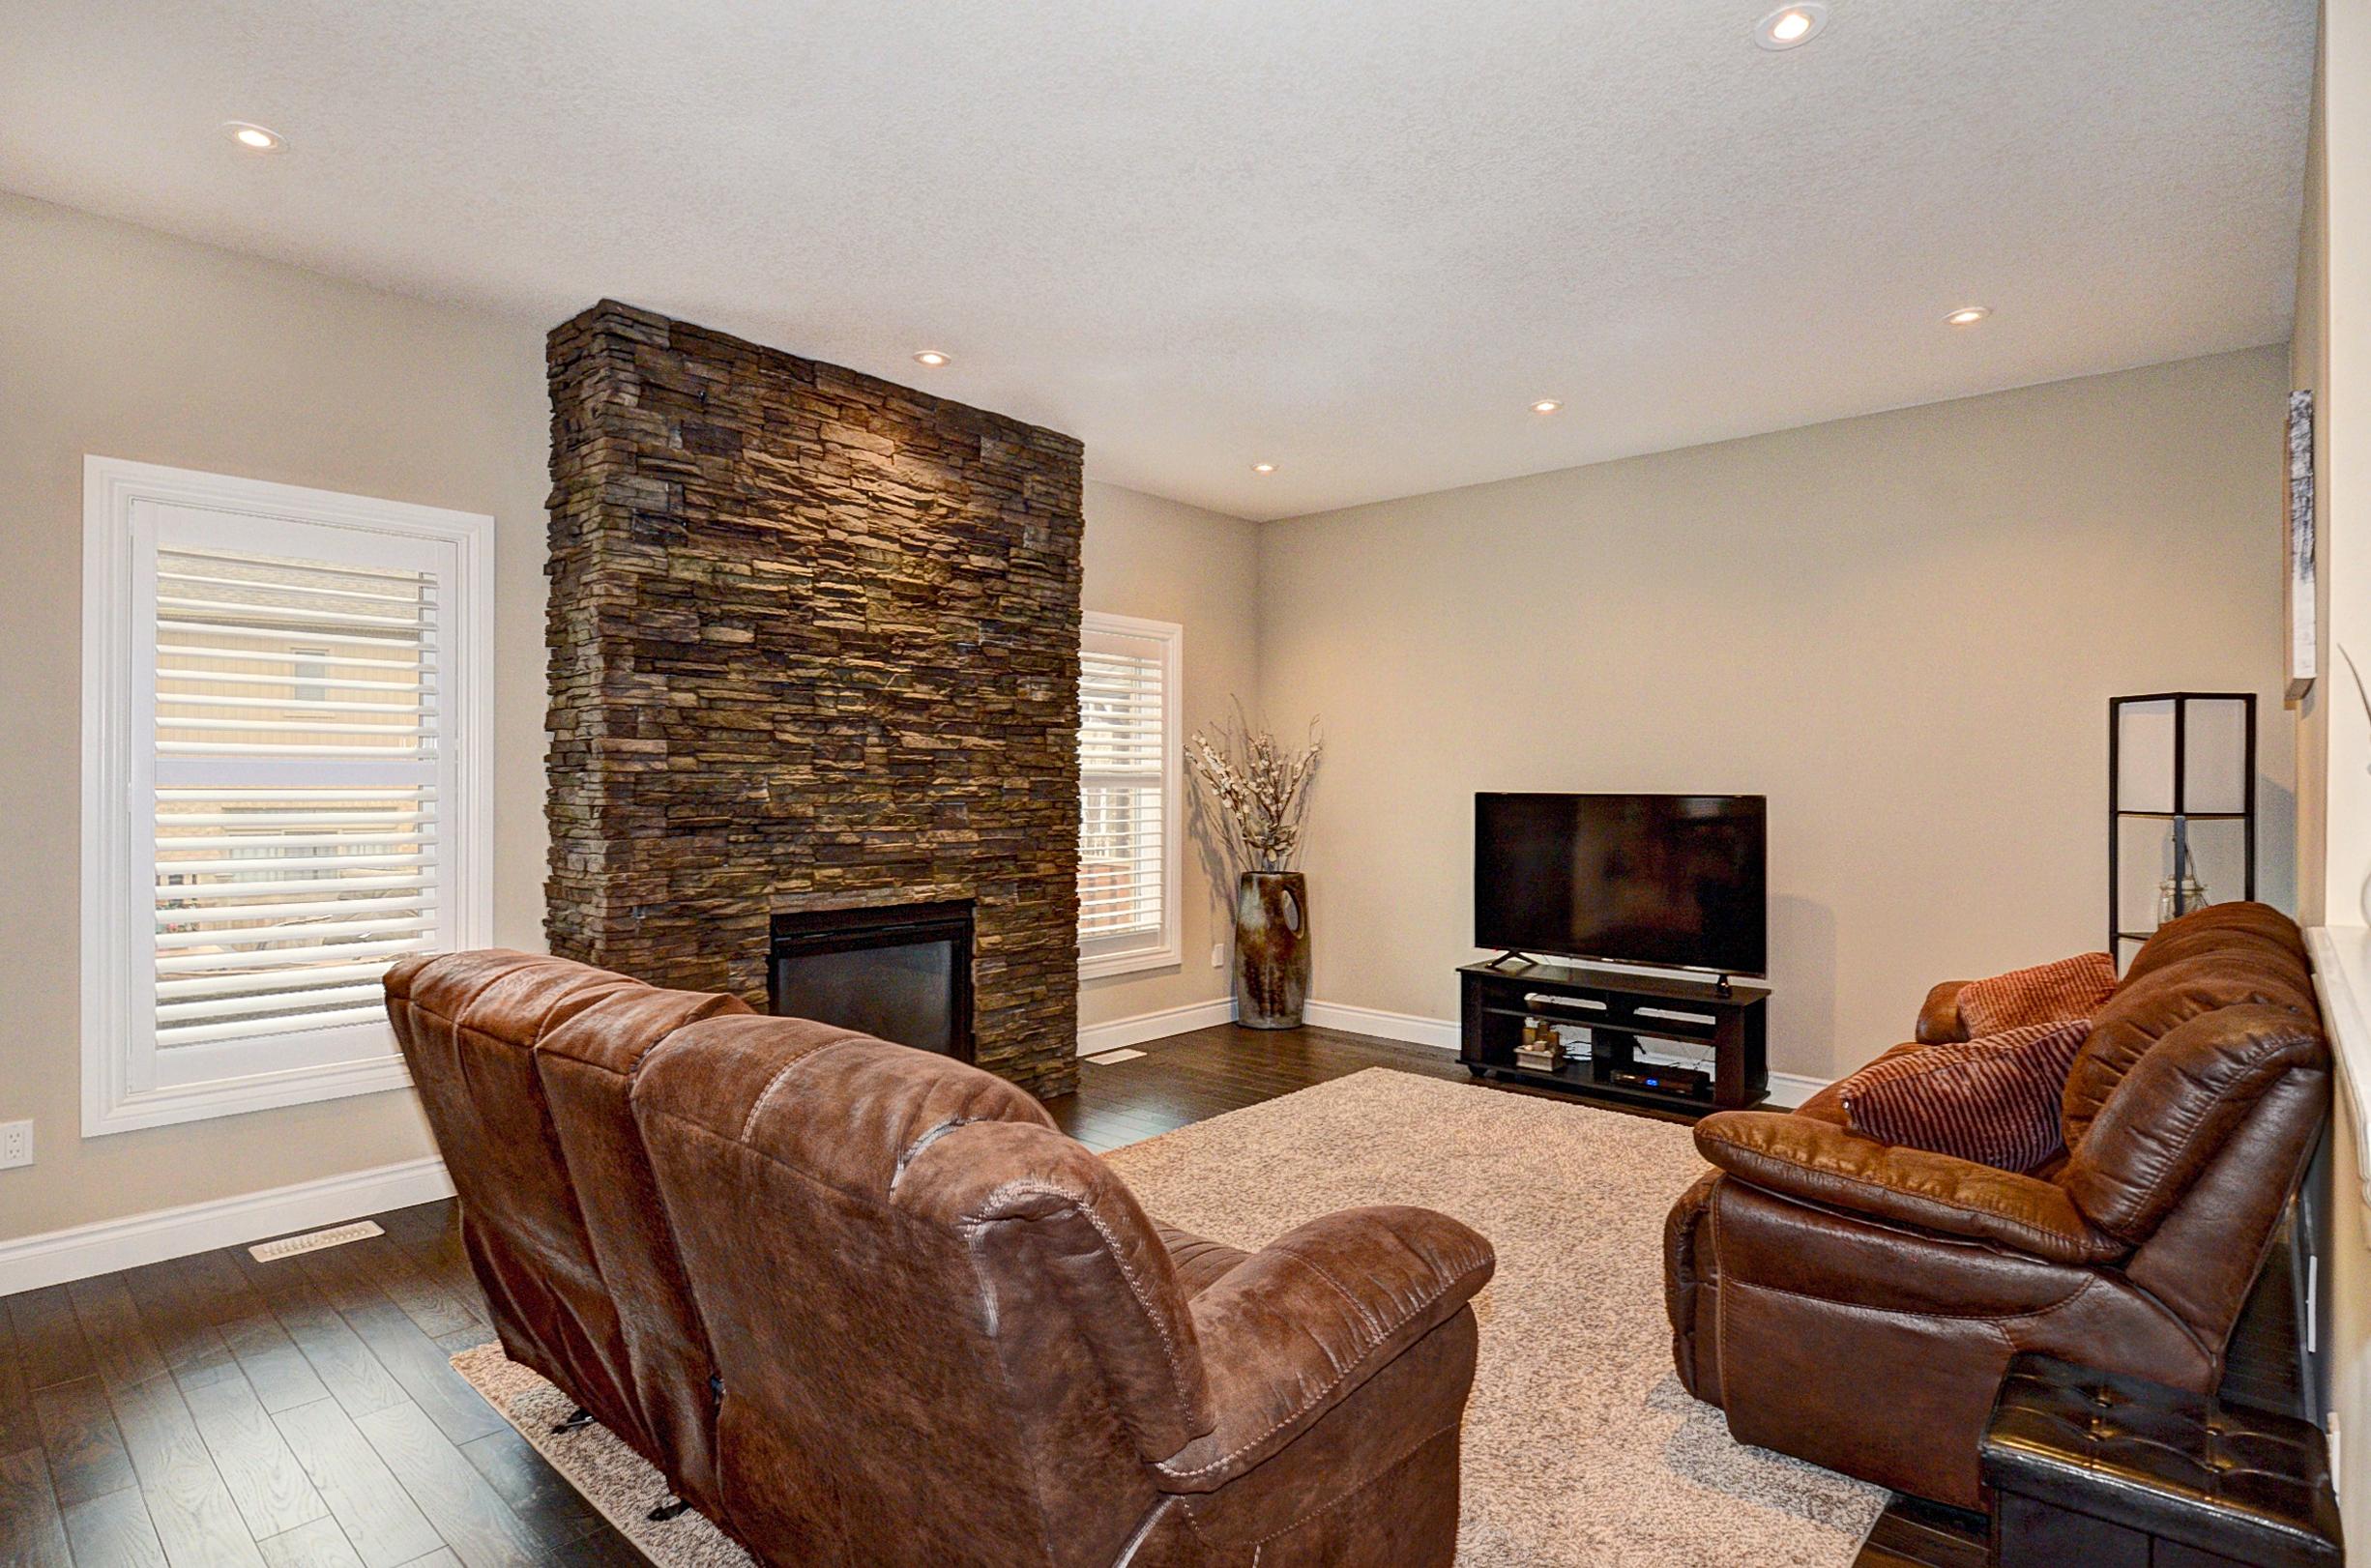 20 Living Room